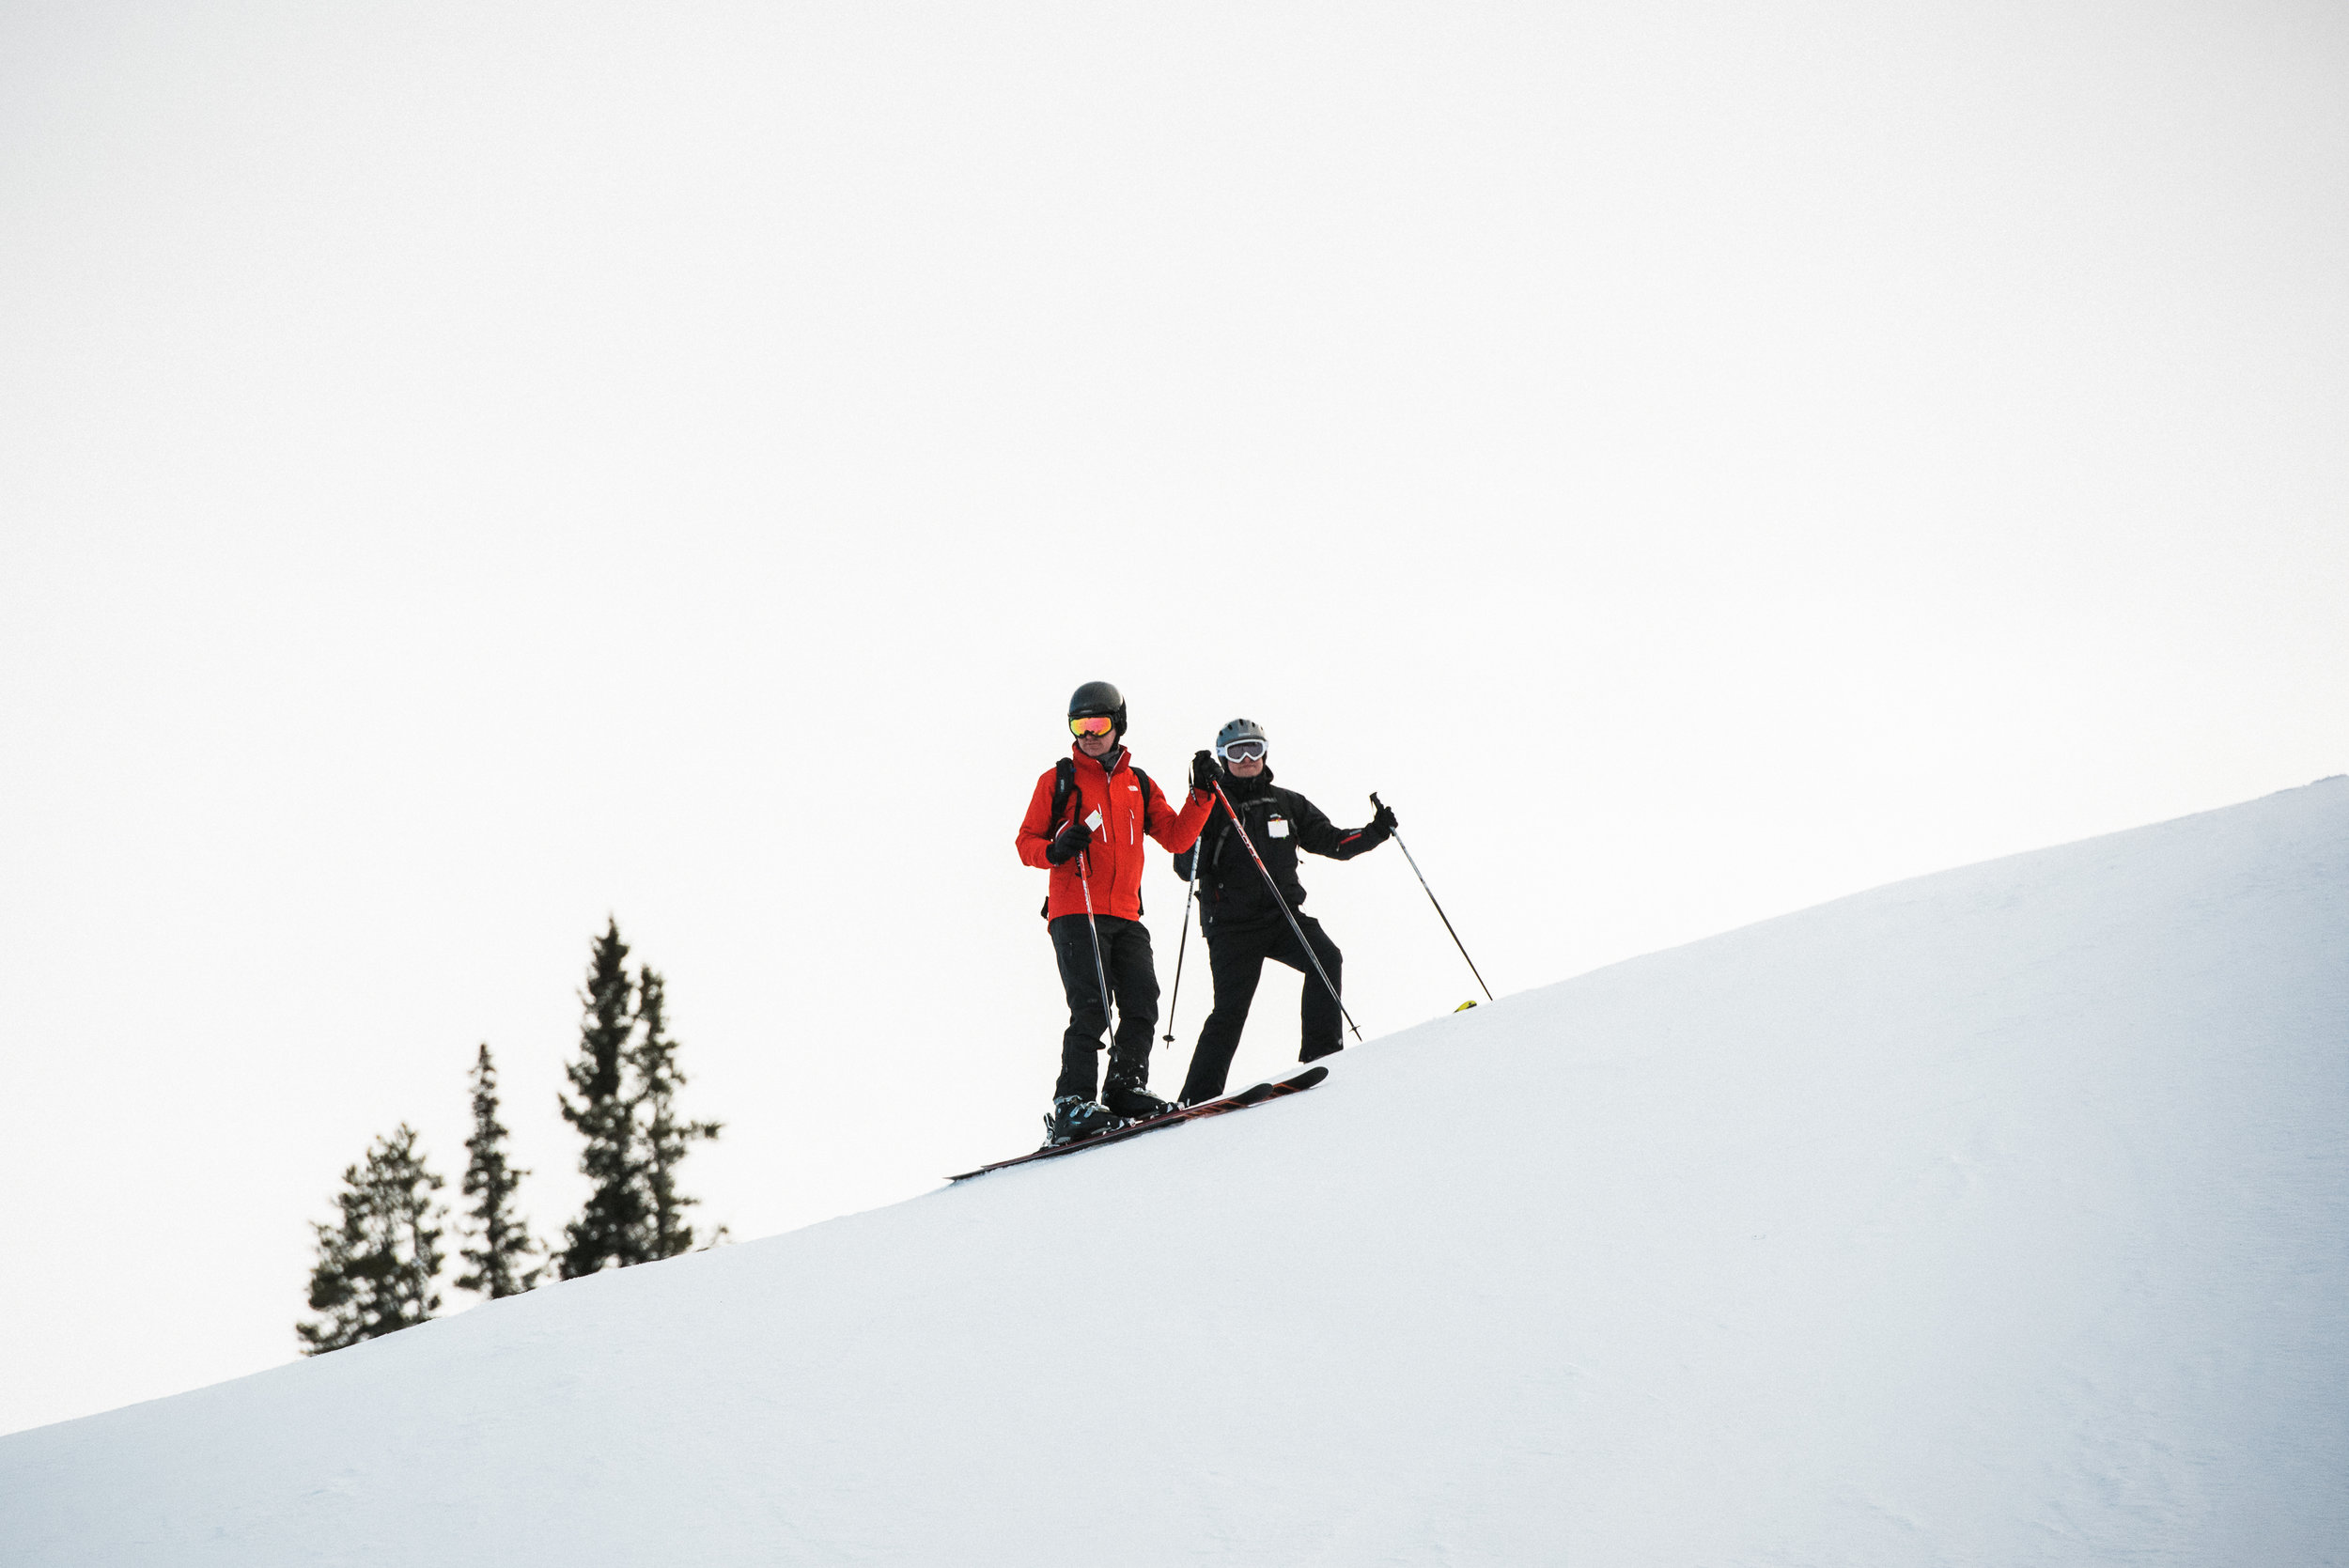 TaraShupe_Outdoor_Photographer_Loweprobags_Colorado_Copper_Mountains_Ski_73.jpg